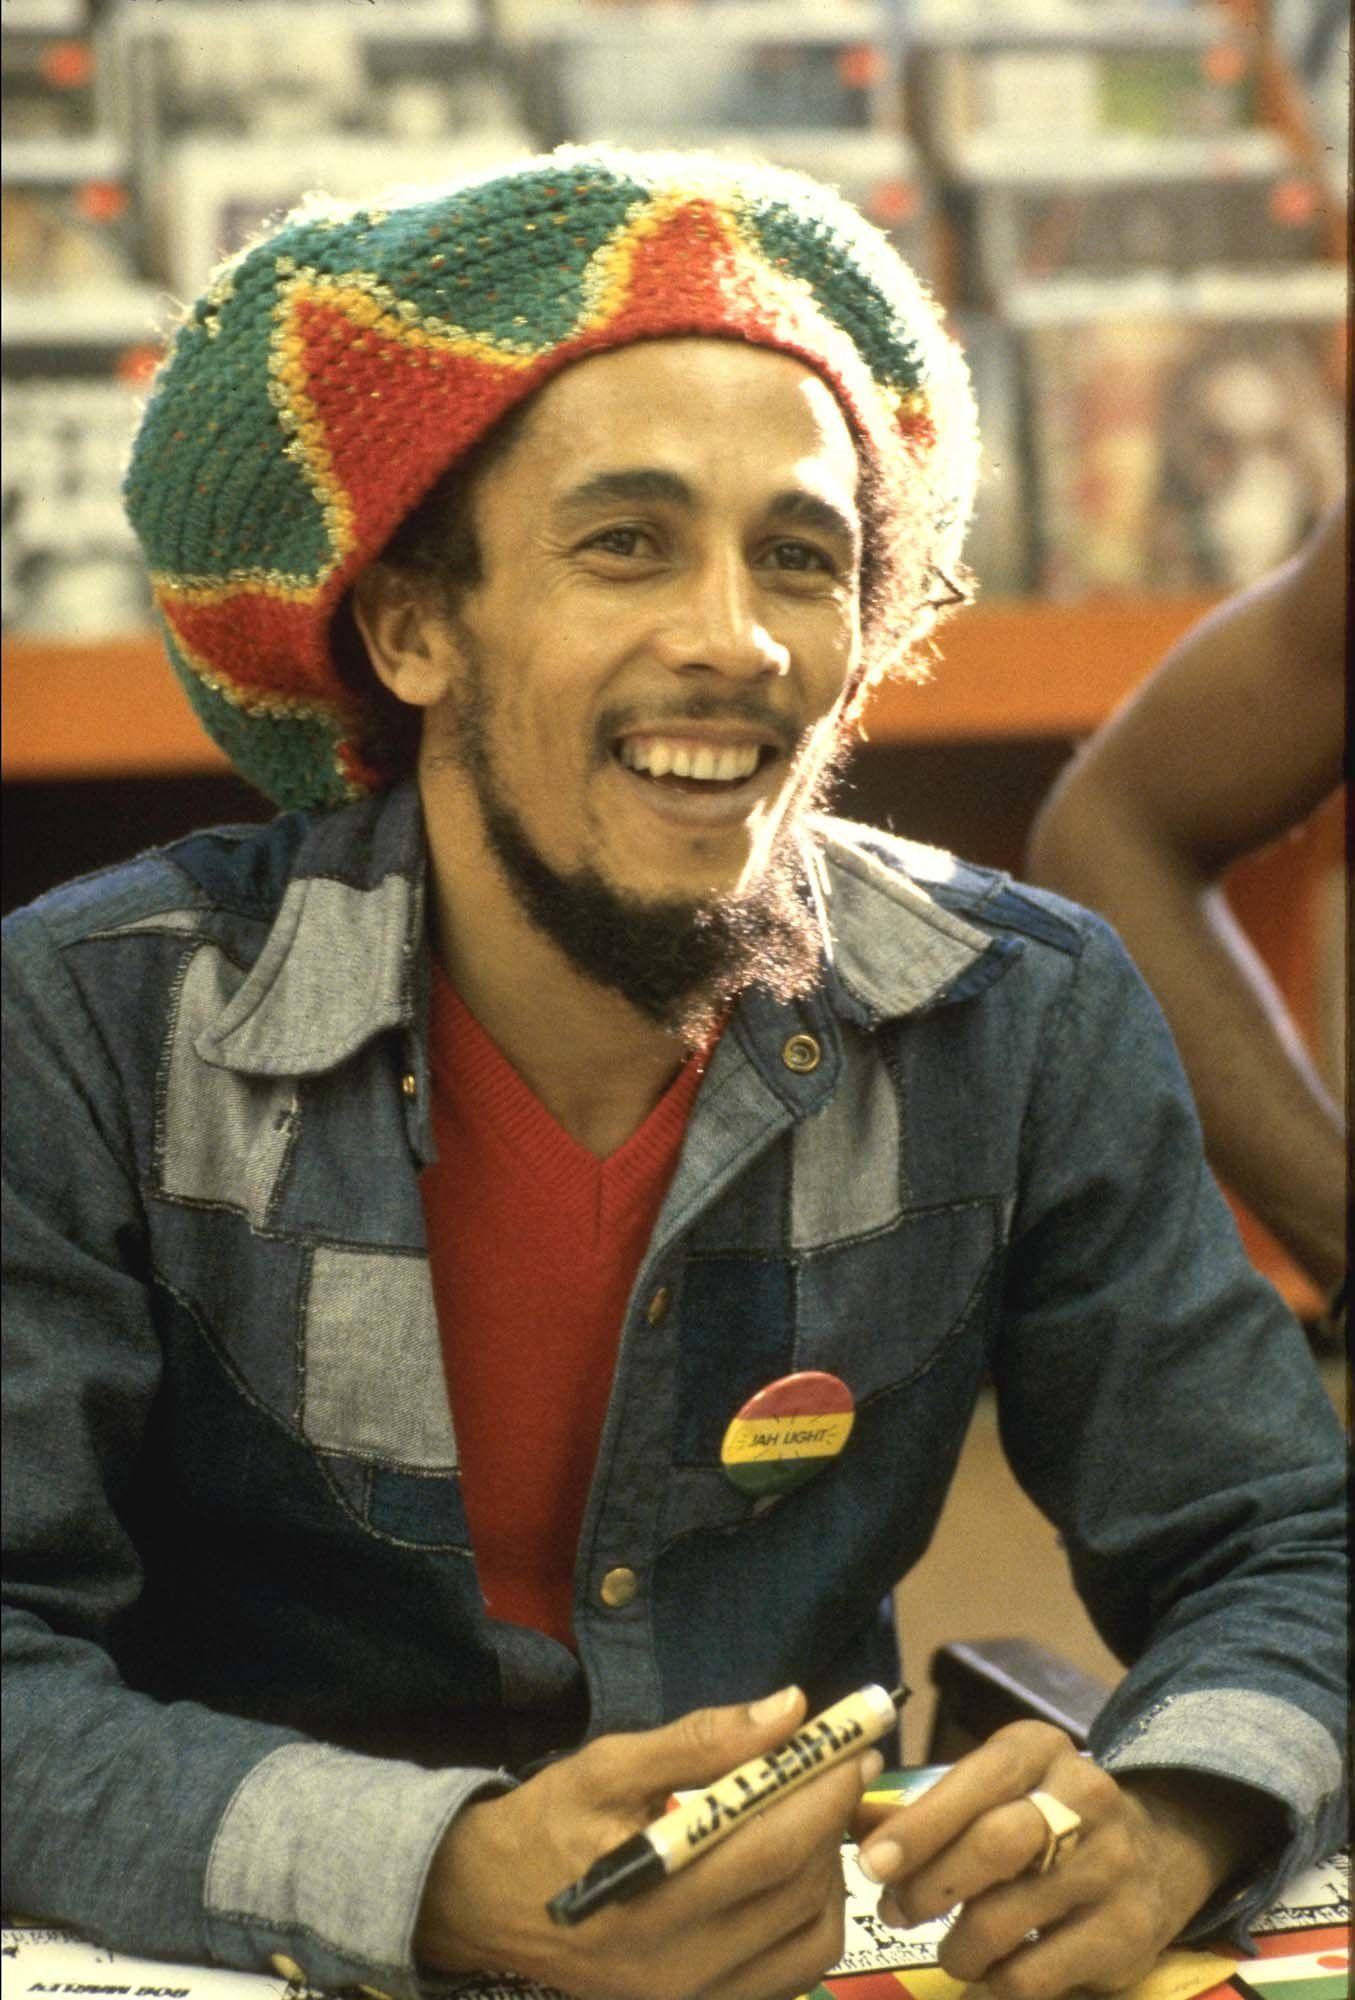 Who  Bob Marley Signature hat  A slouchy knit 20c70fddf76